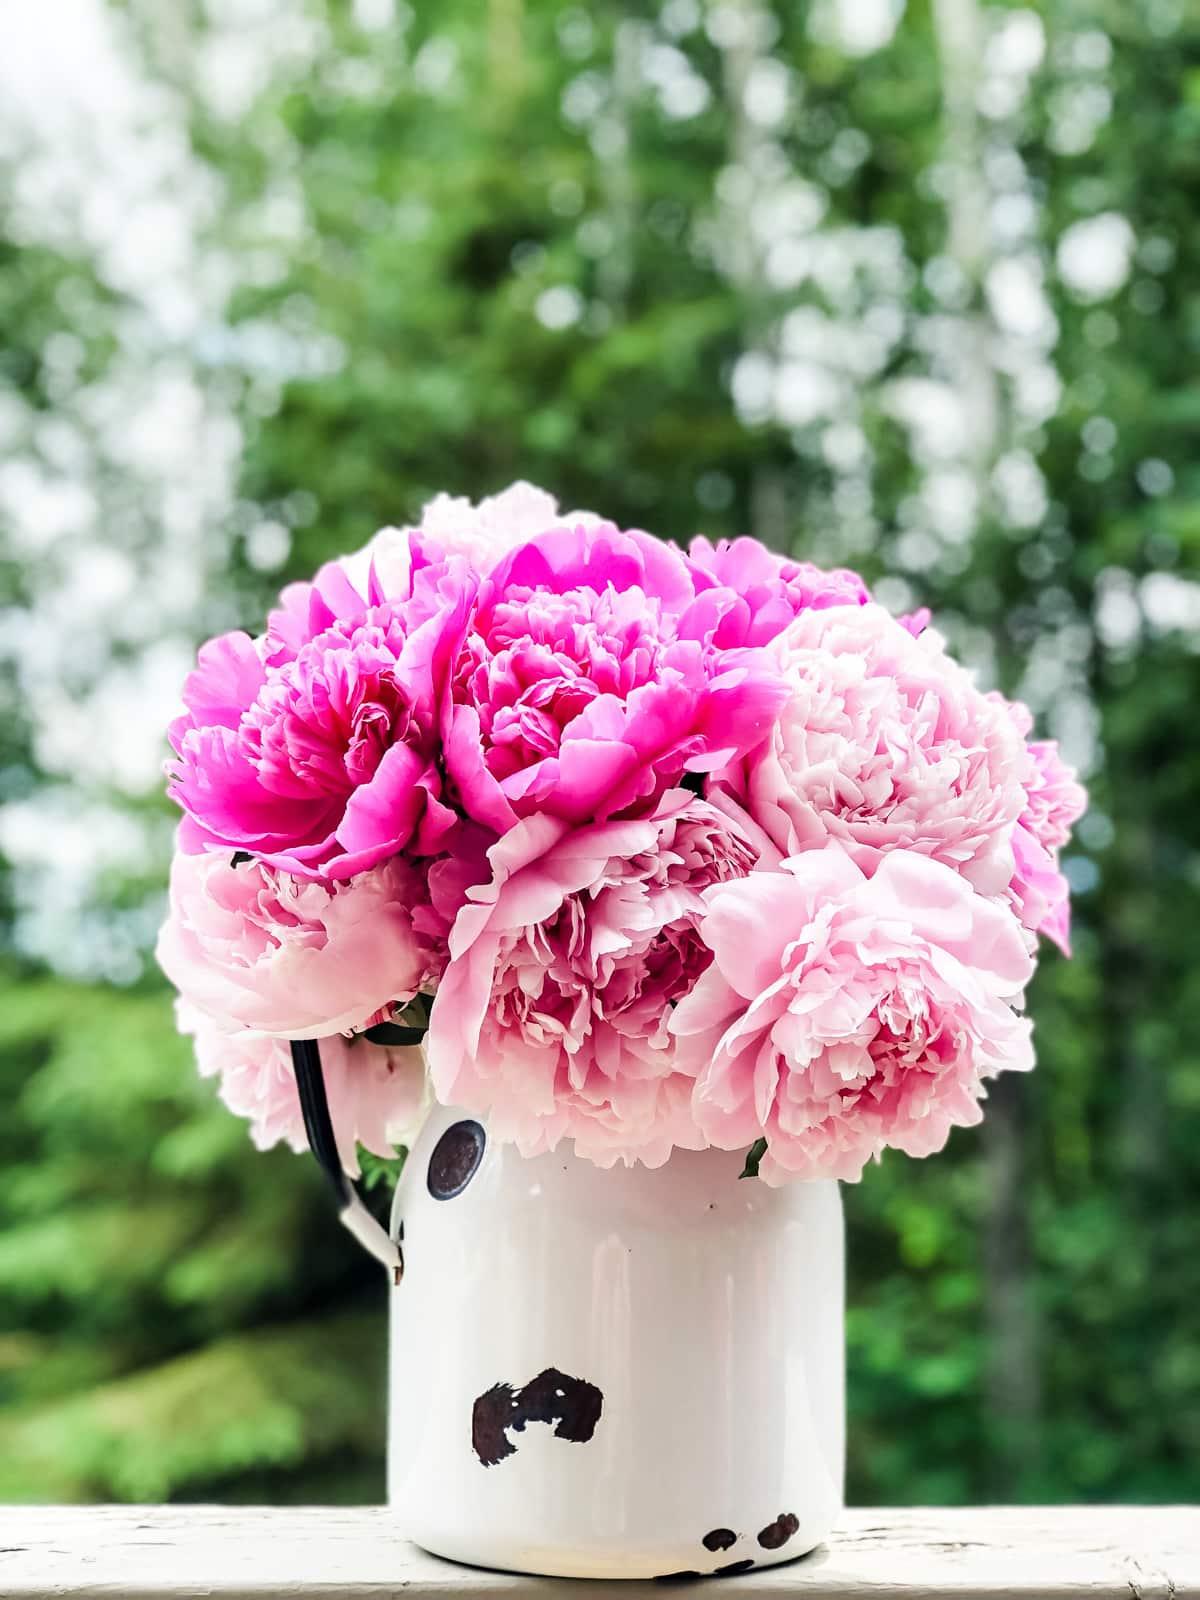 Beautiful Bouquet of Peonies